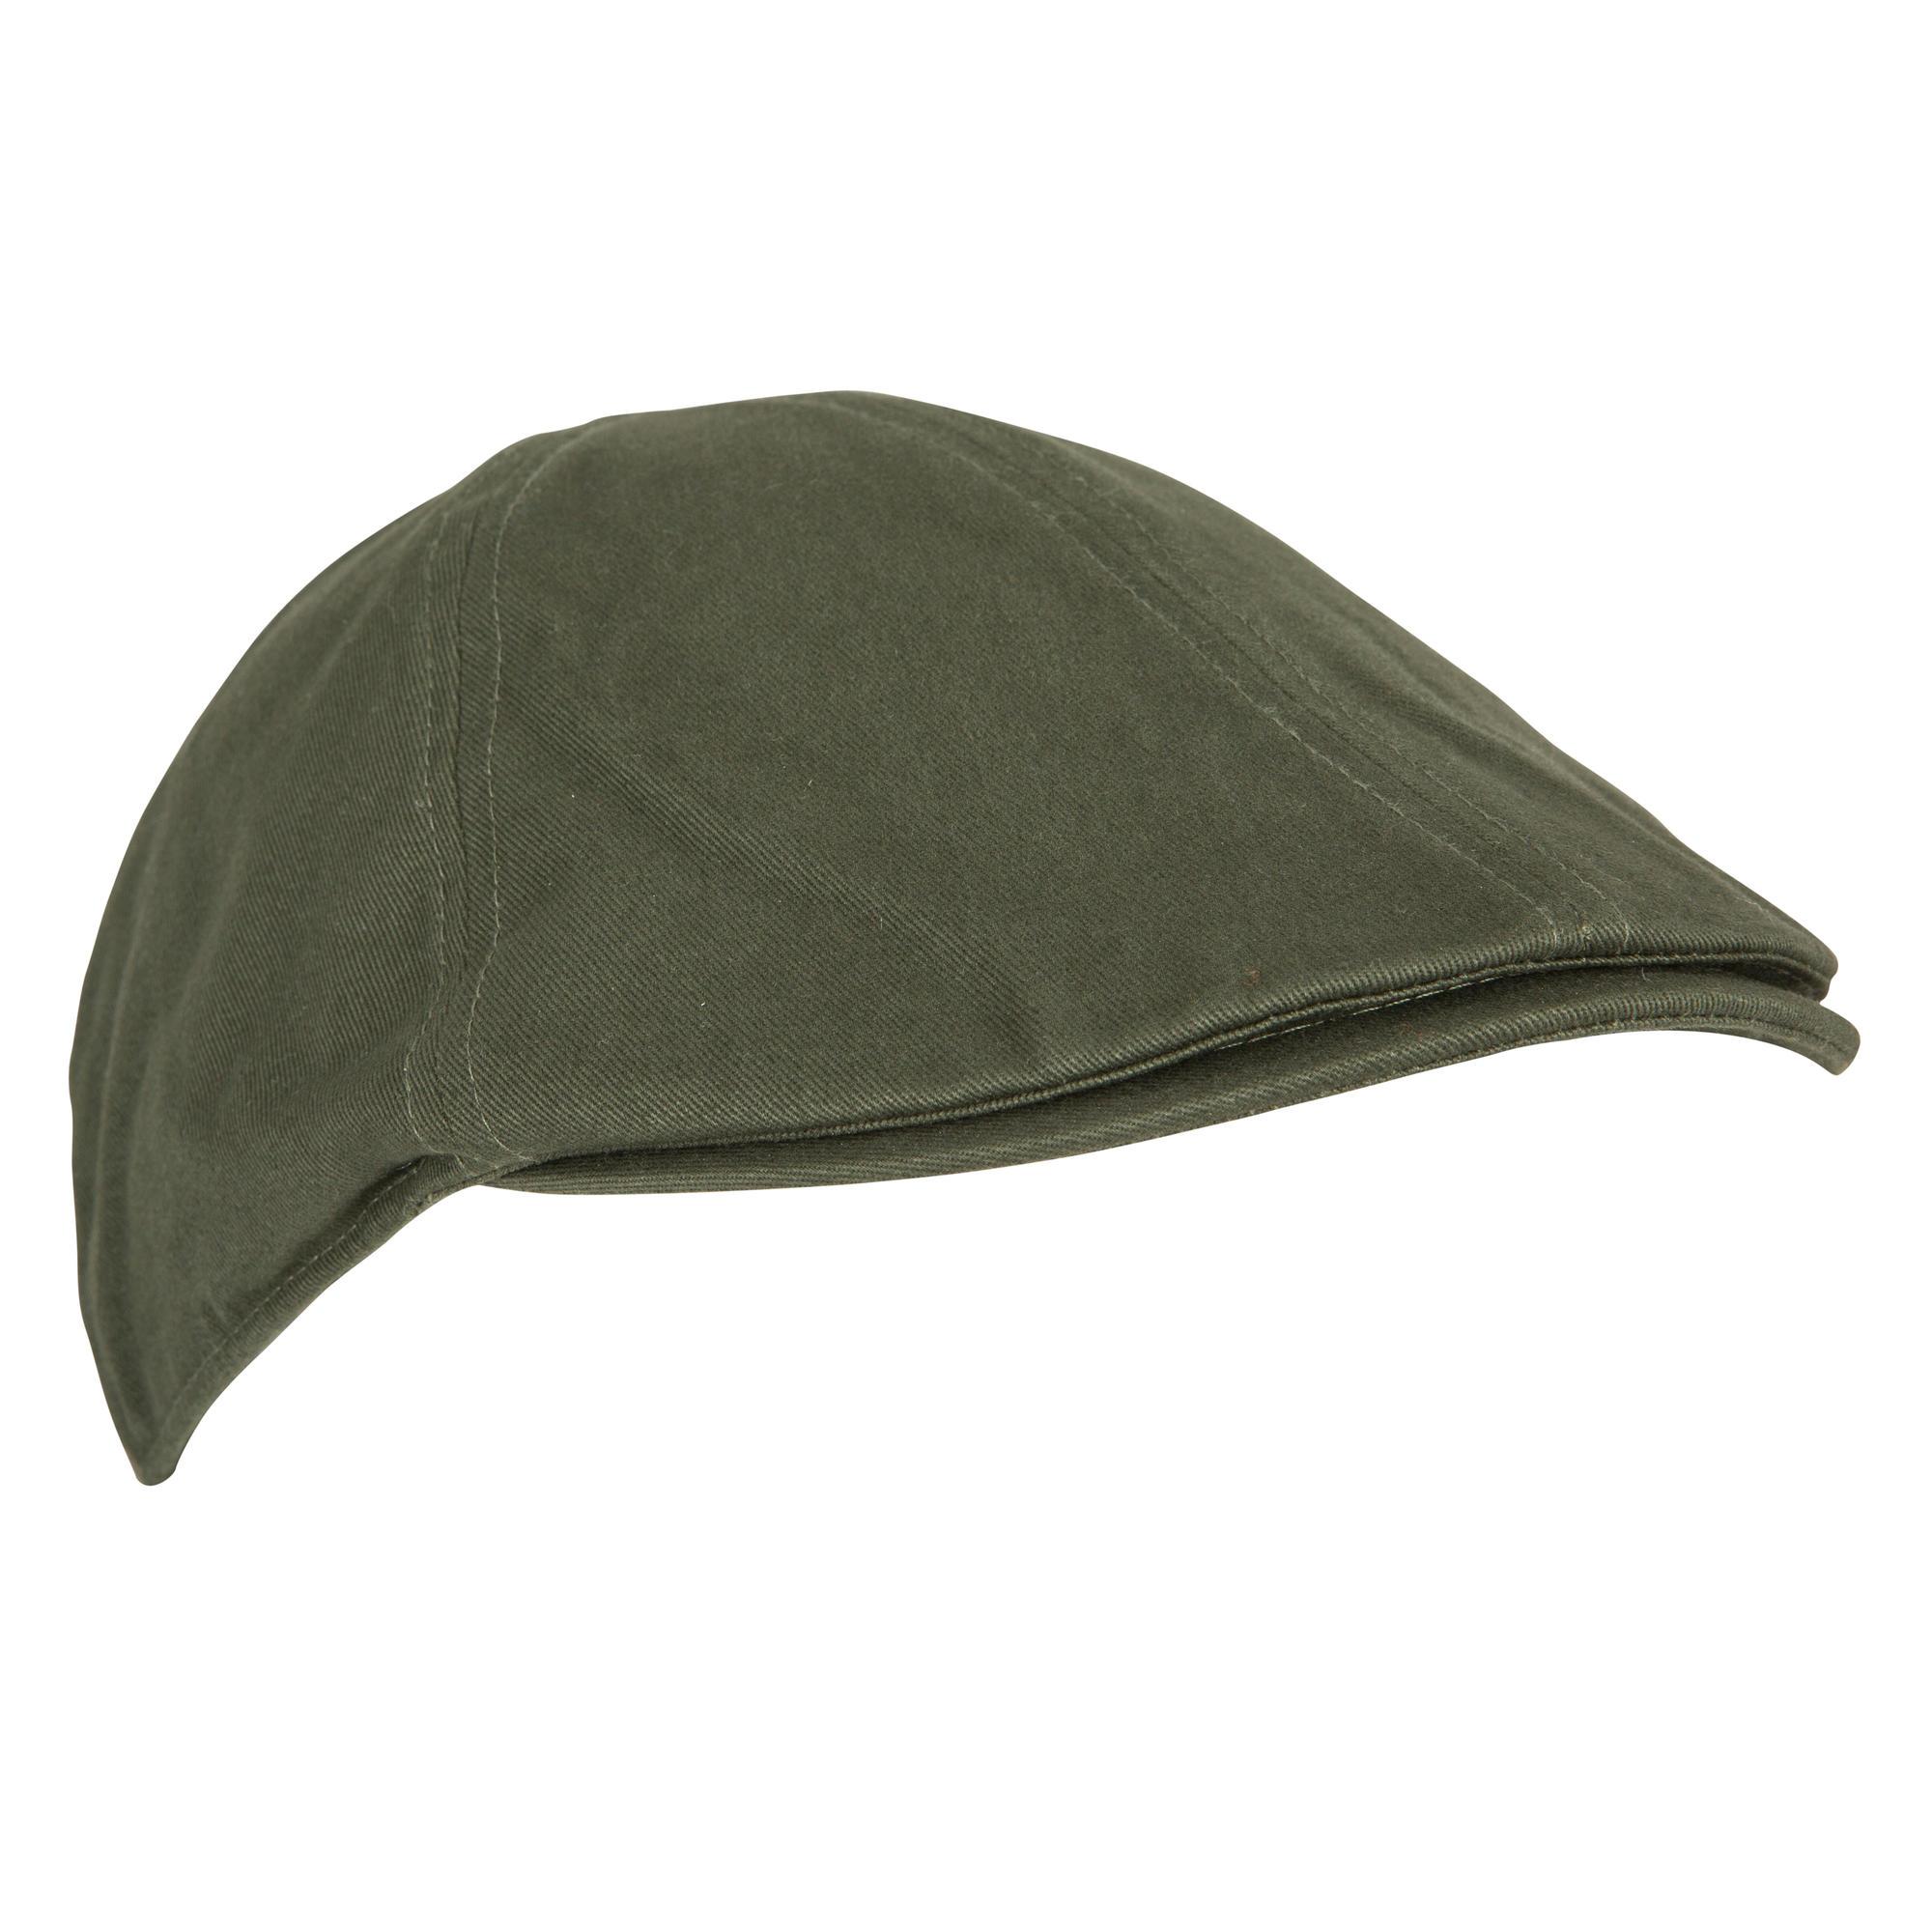 1f414b67524 Steppe flat cap green solognac jpg 2000x2000 Green flat cap